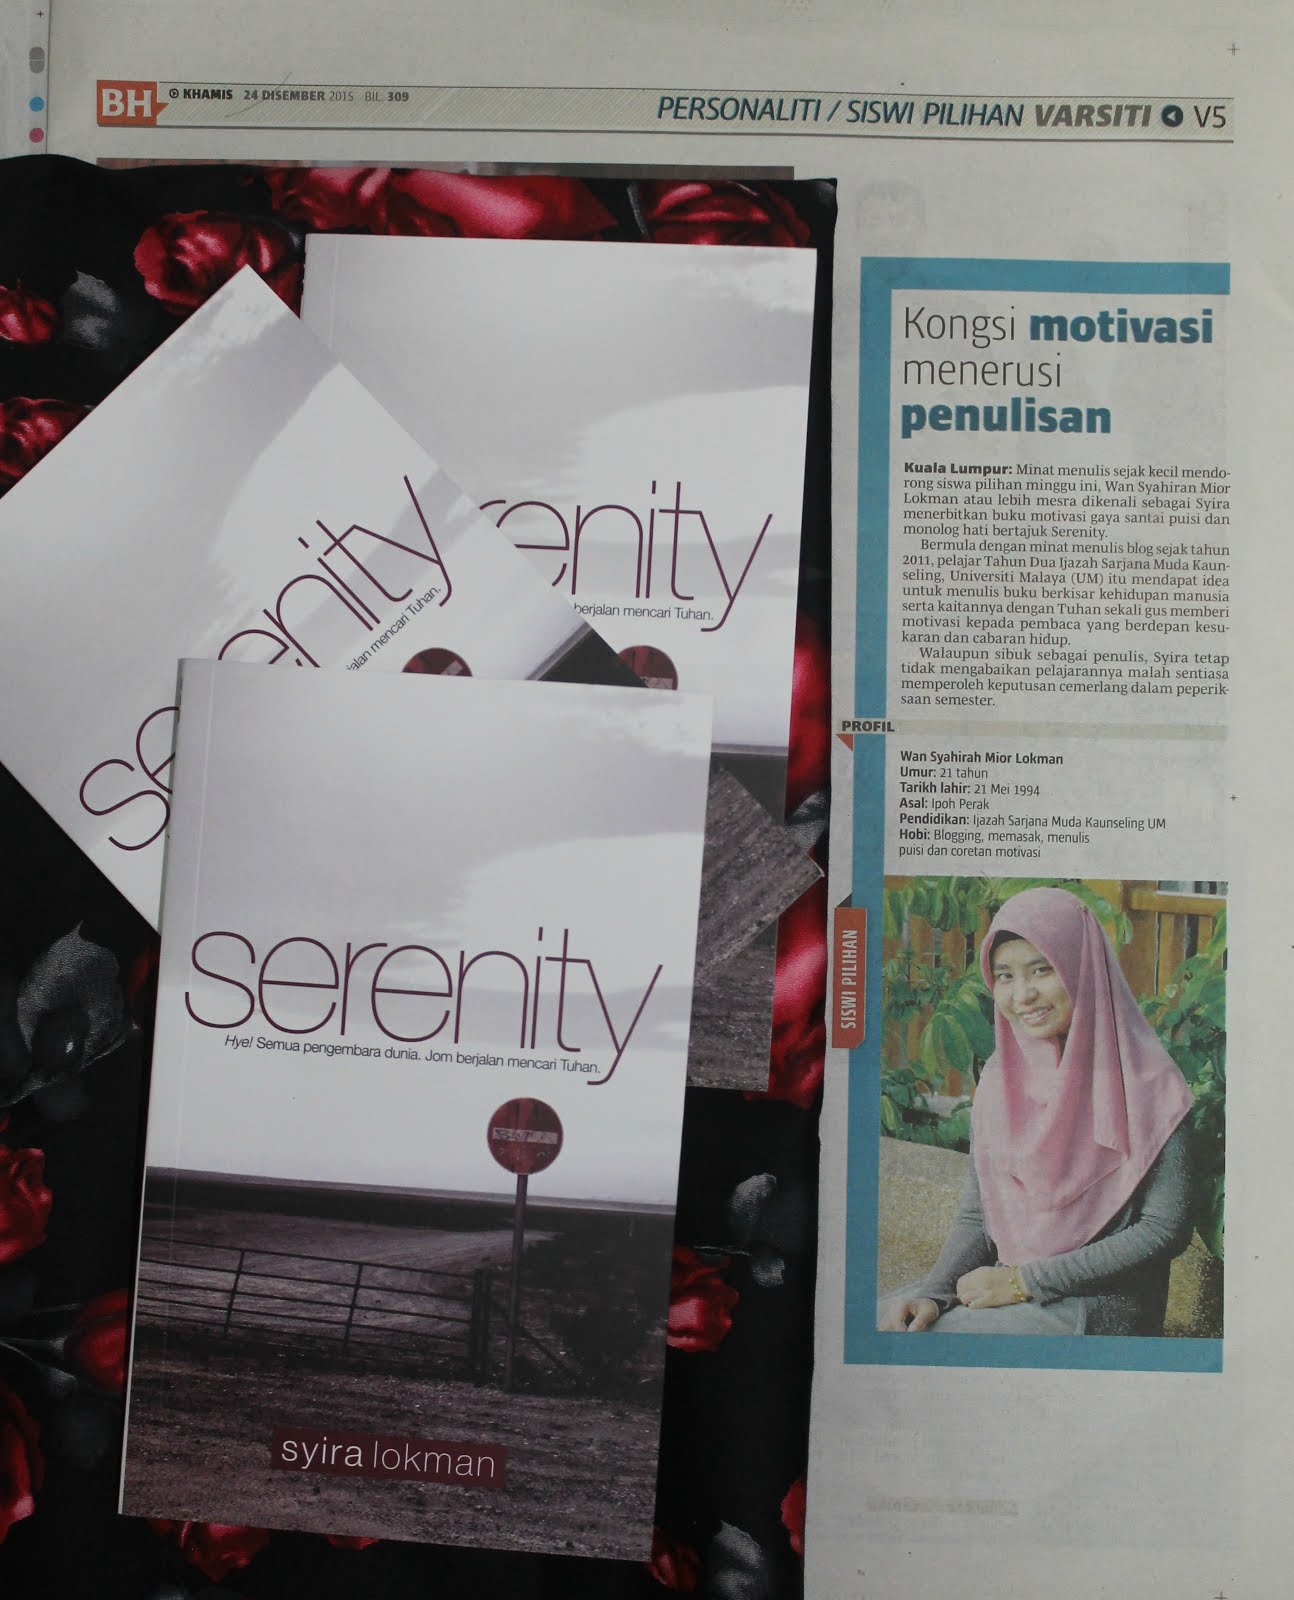 SERENITY Siswi Pilihan BH 2016